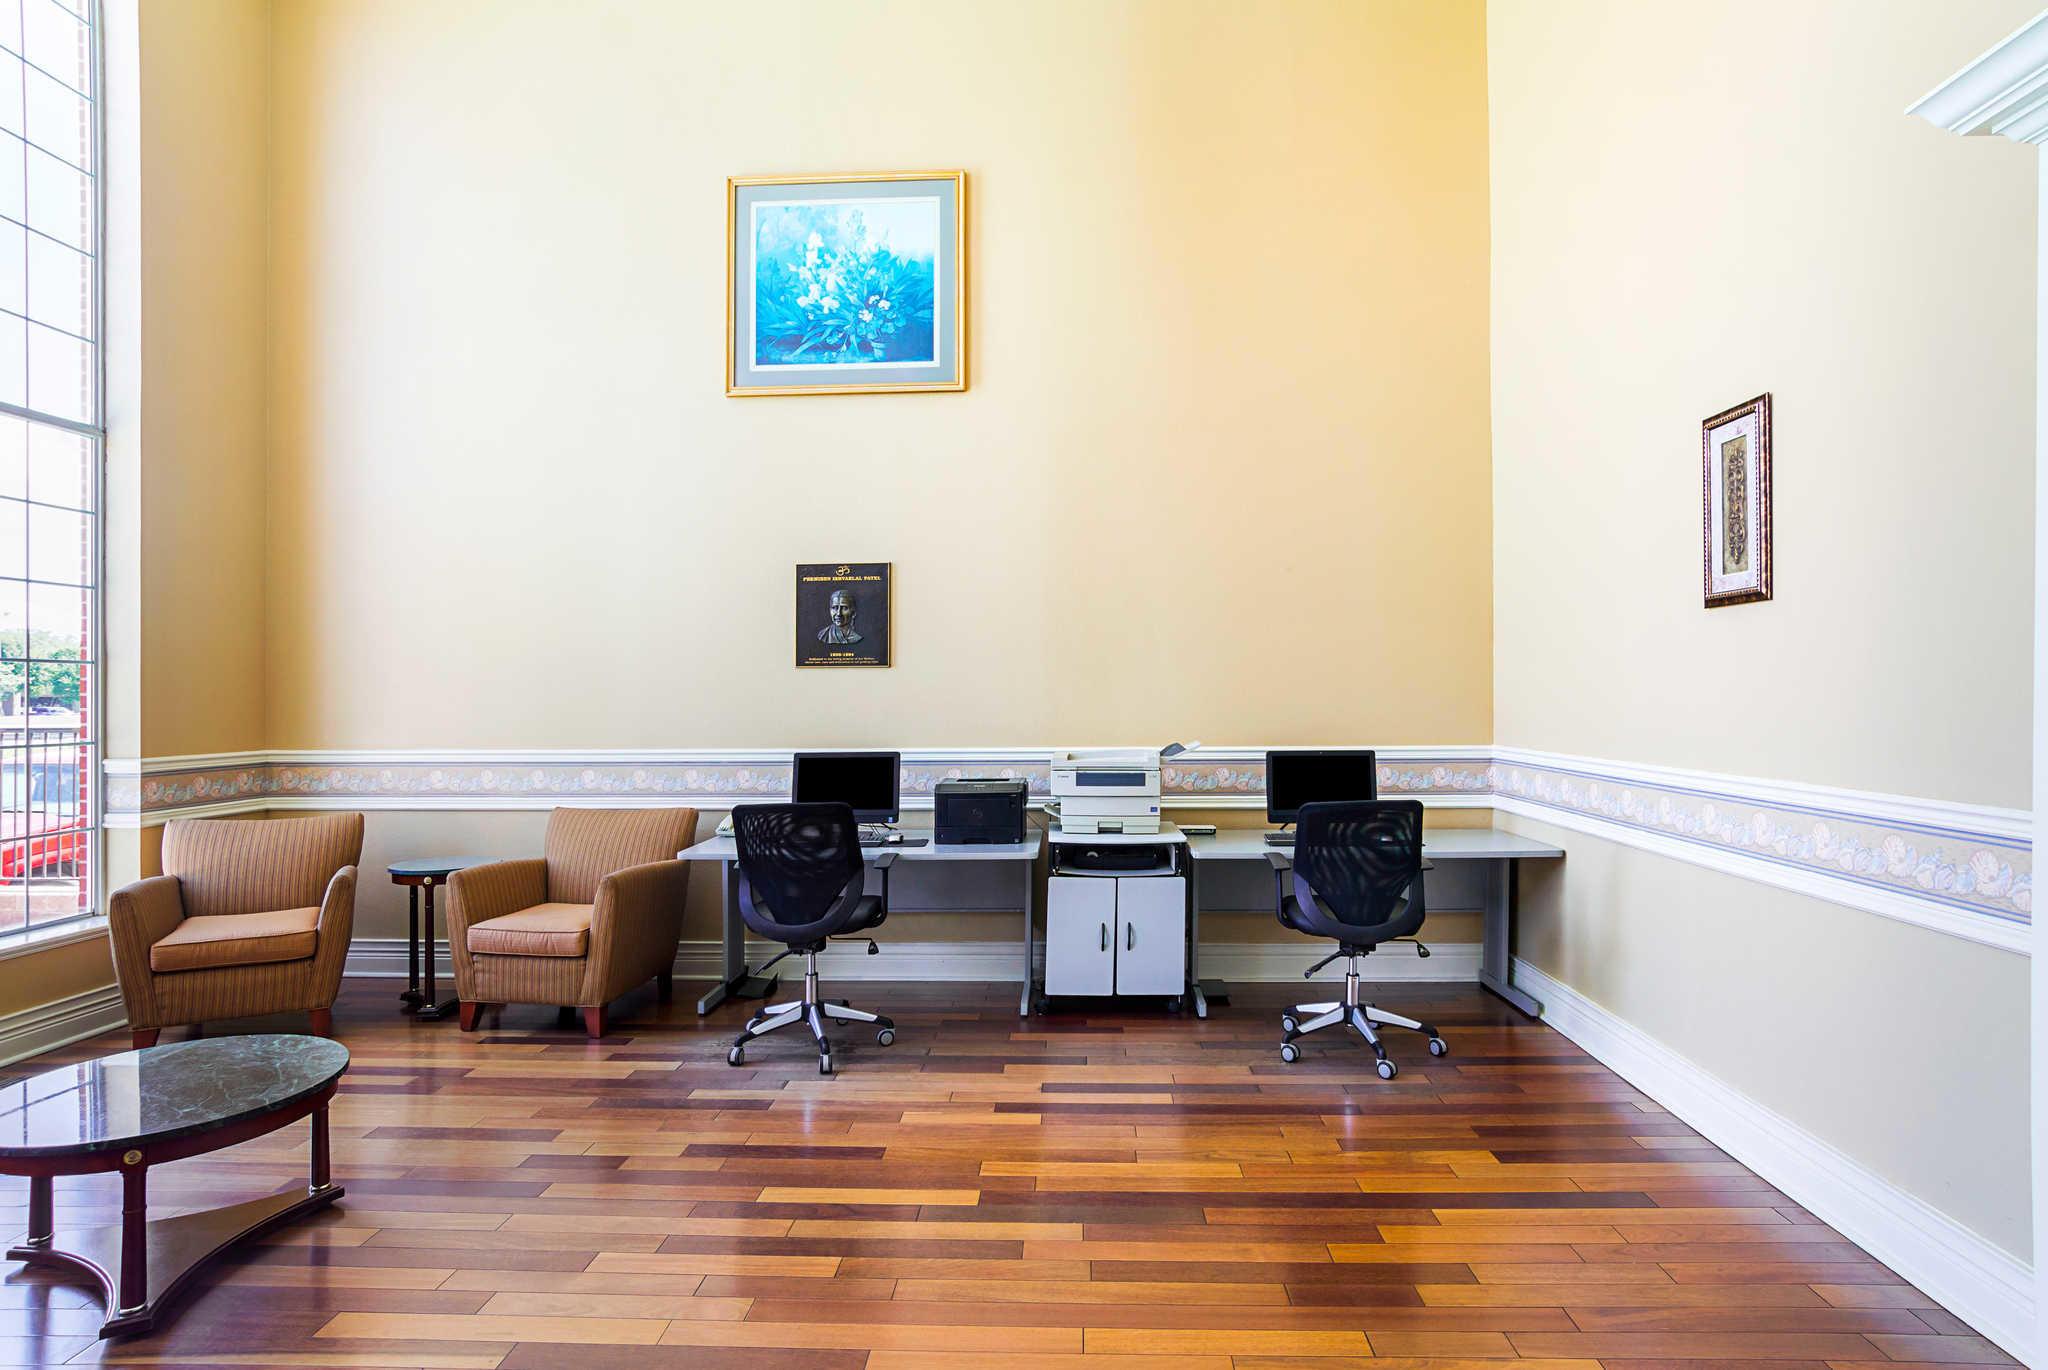 Comfort Suites image 53